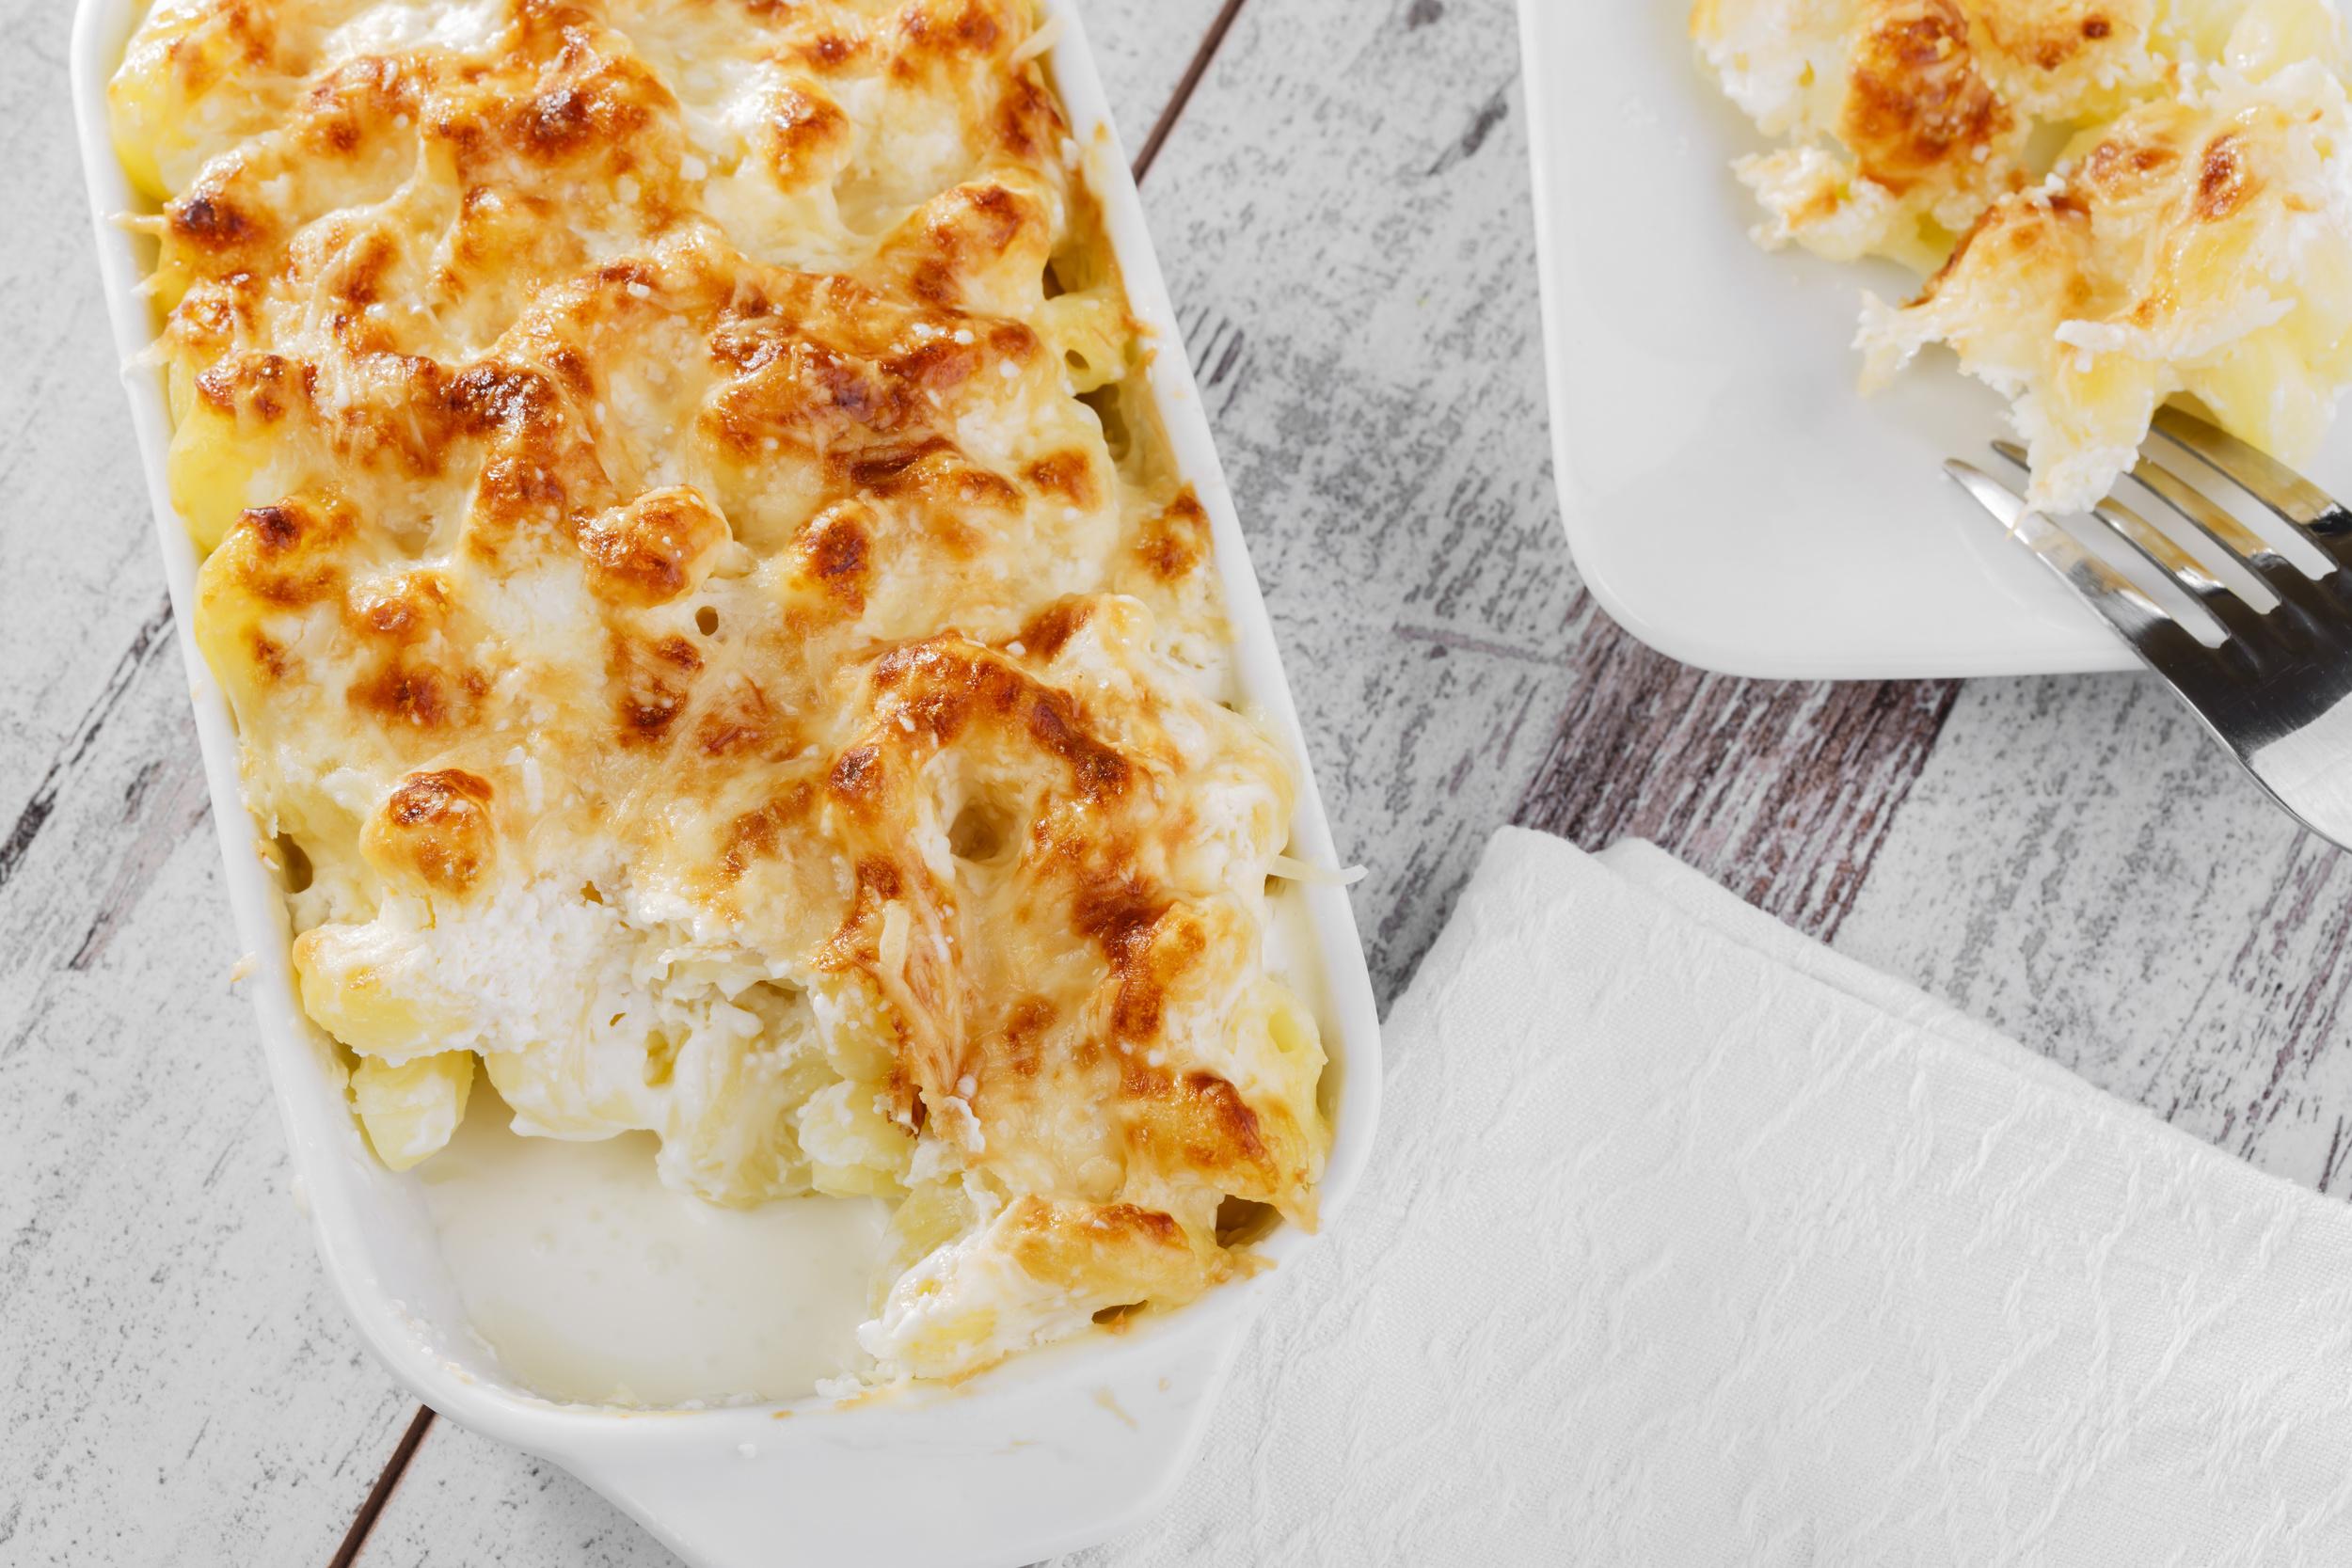 Vive-Cooking-School-Macaroni-Cheese.jpeg